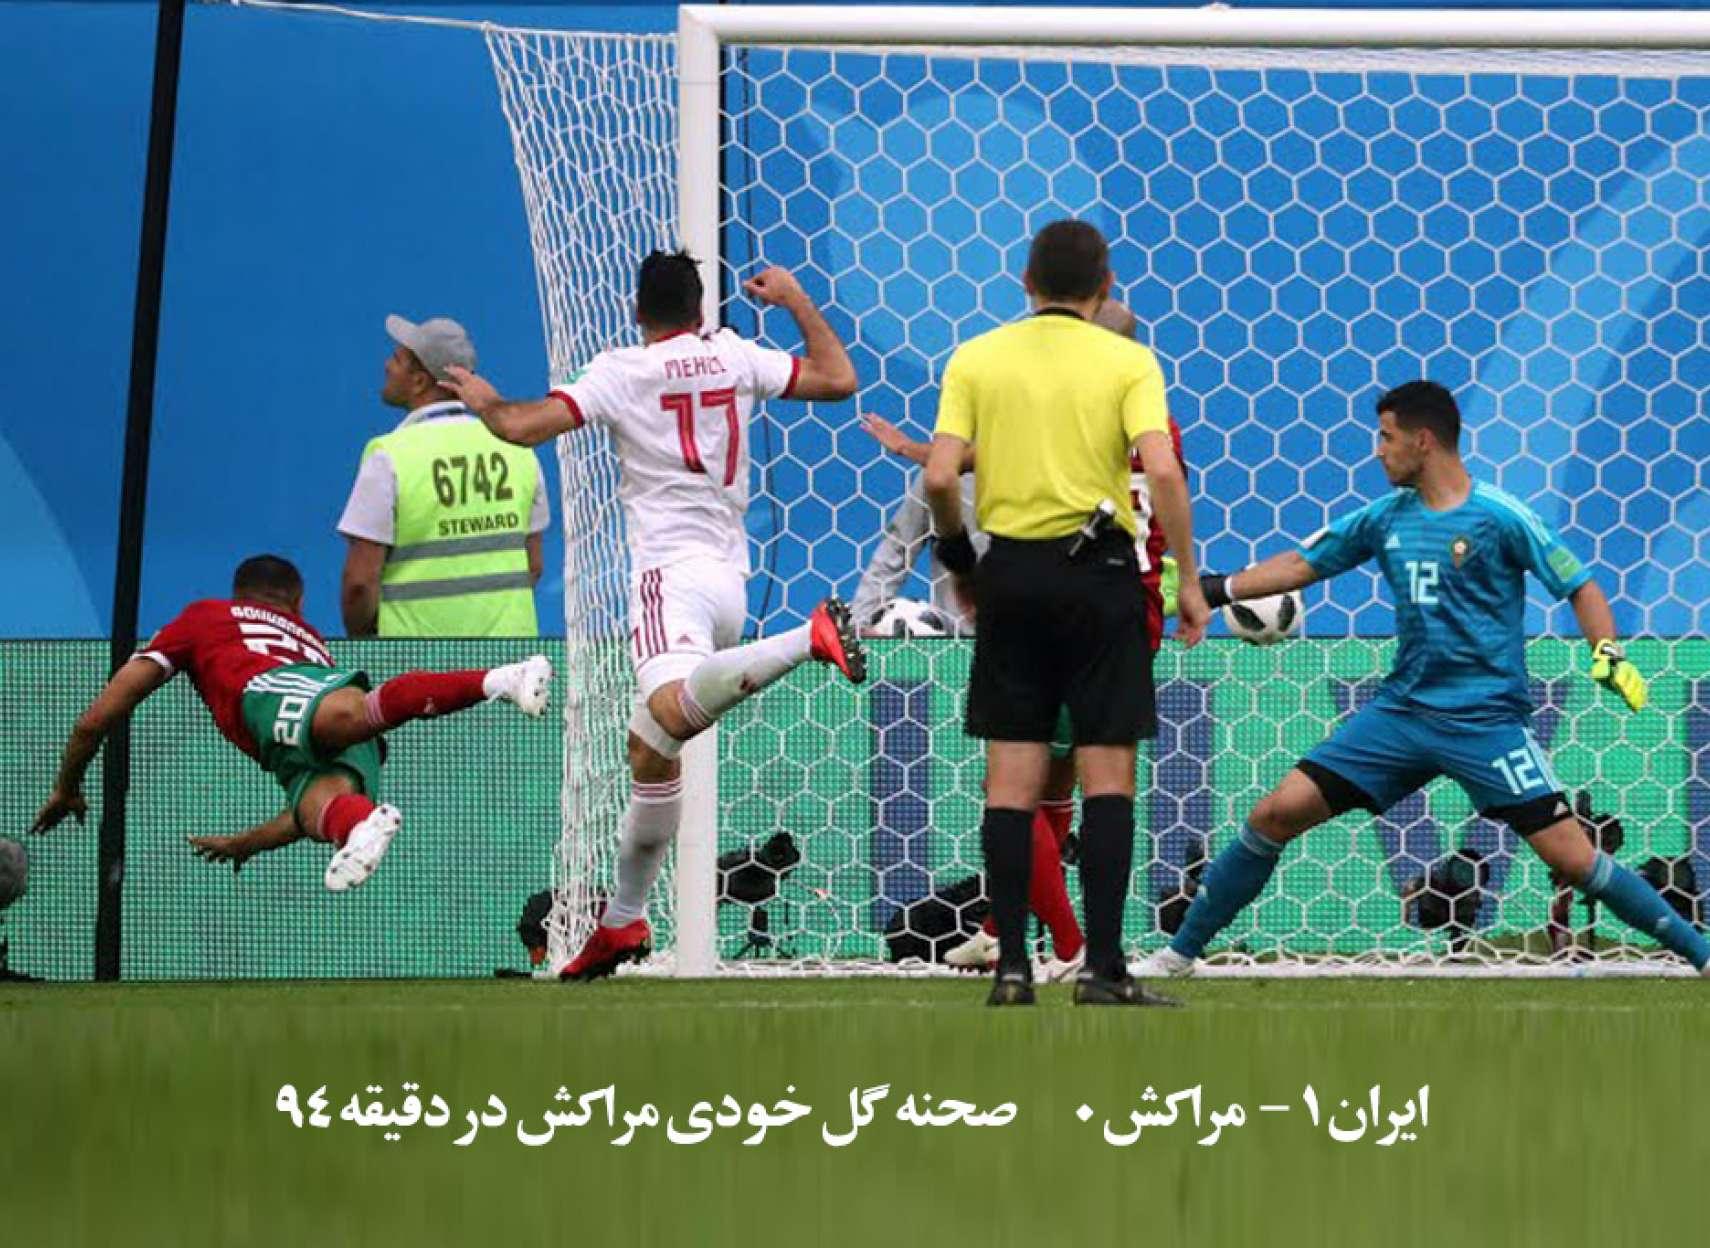 news-iran-maorroco